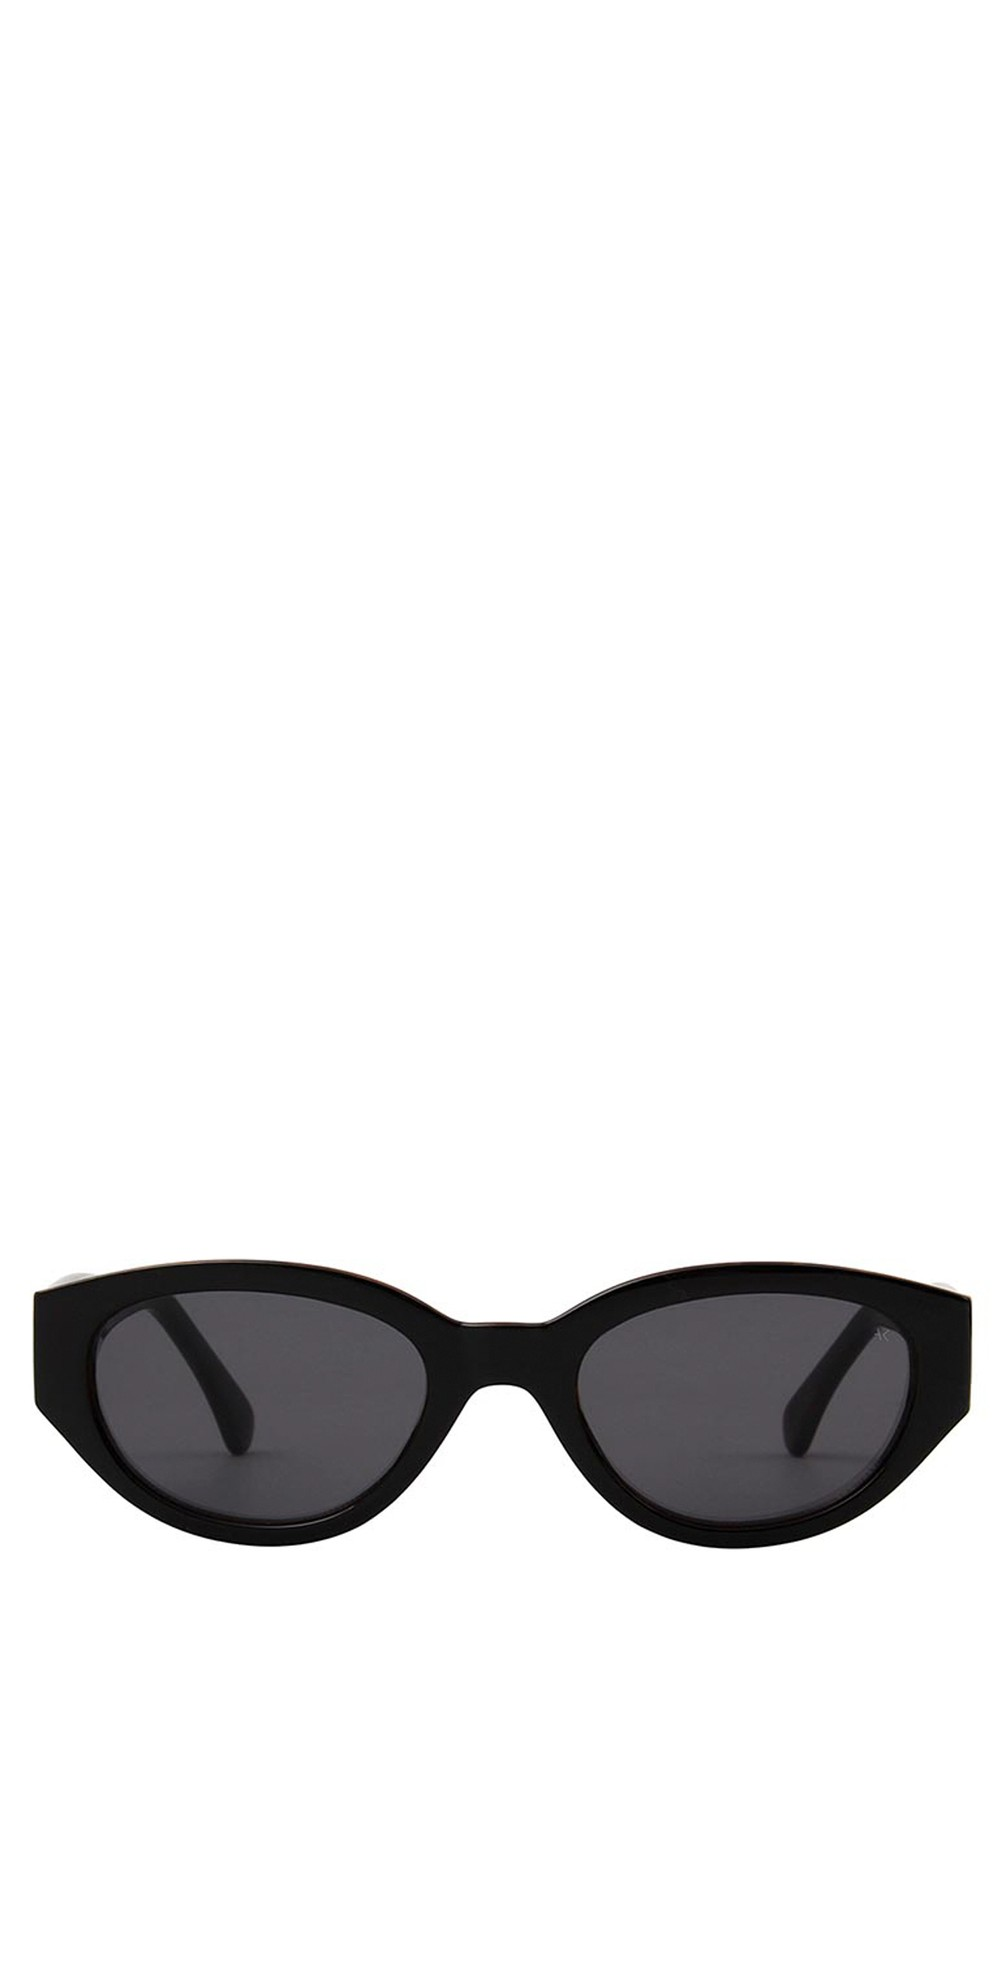 Winnie Sunglasses main image